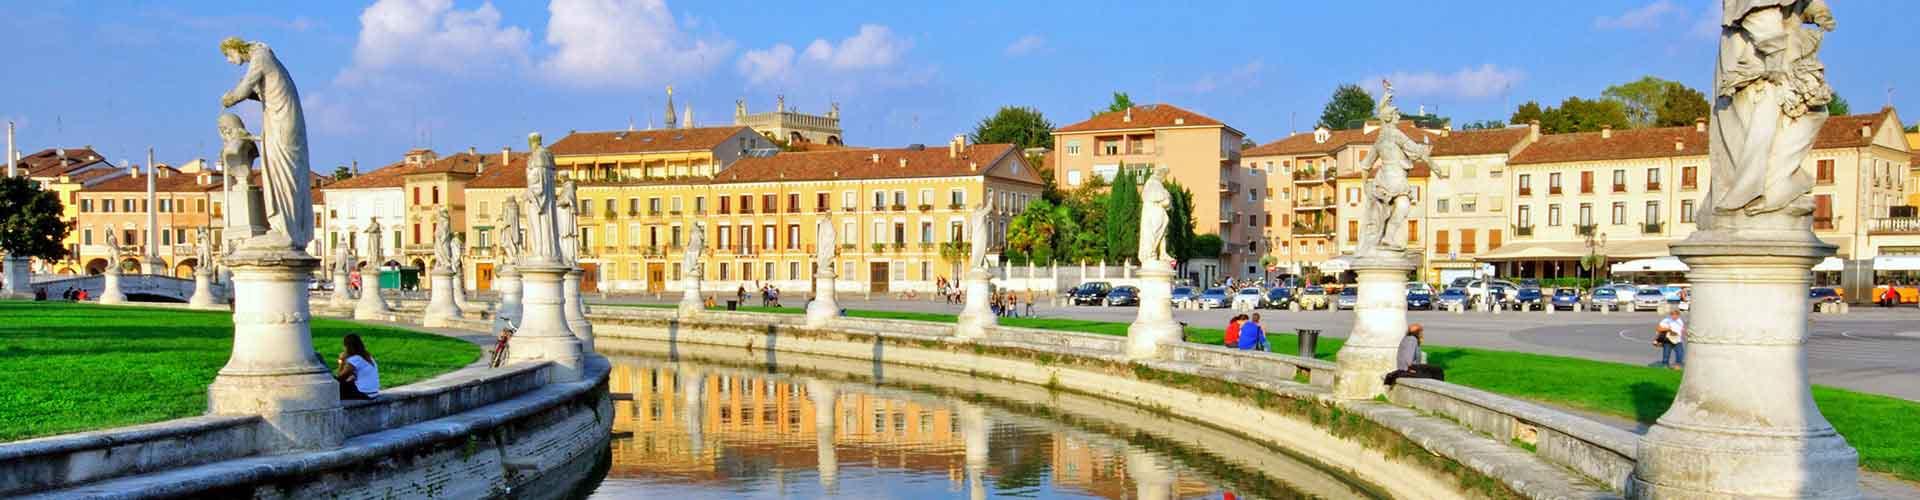 Padova - Apartamentos en Padova. Mapas de Padova, Fotos y comentarios de cada Apartamento en Padova.